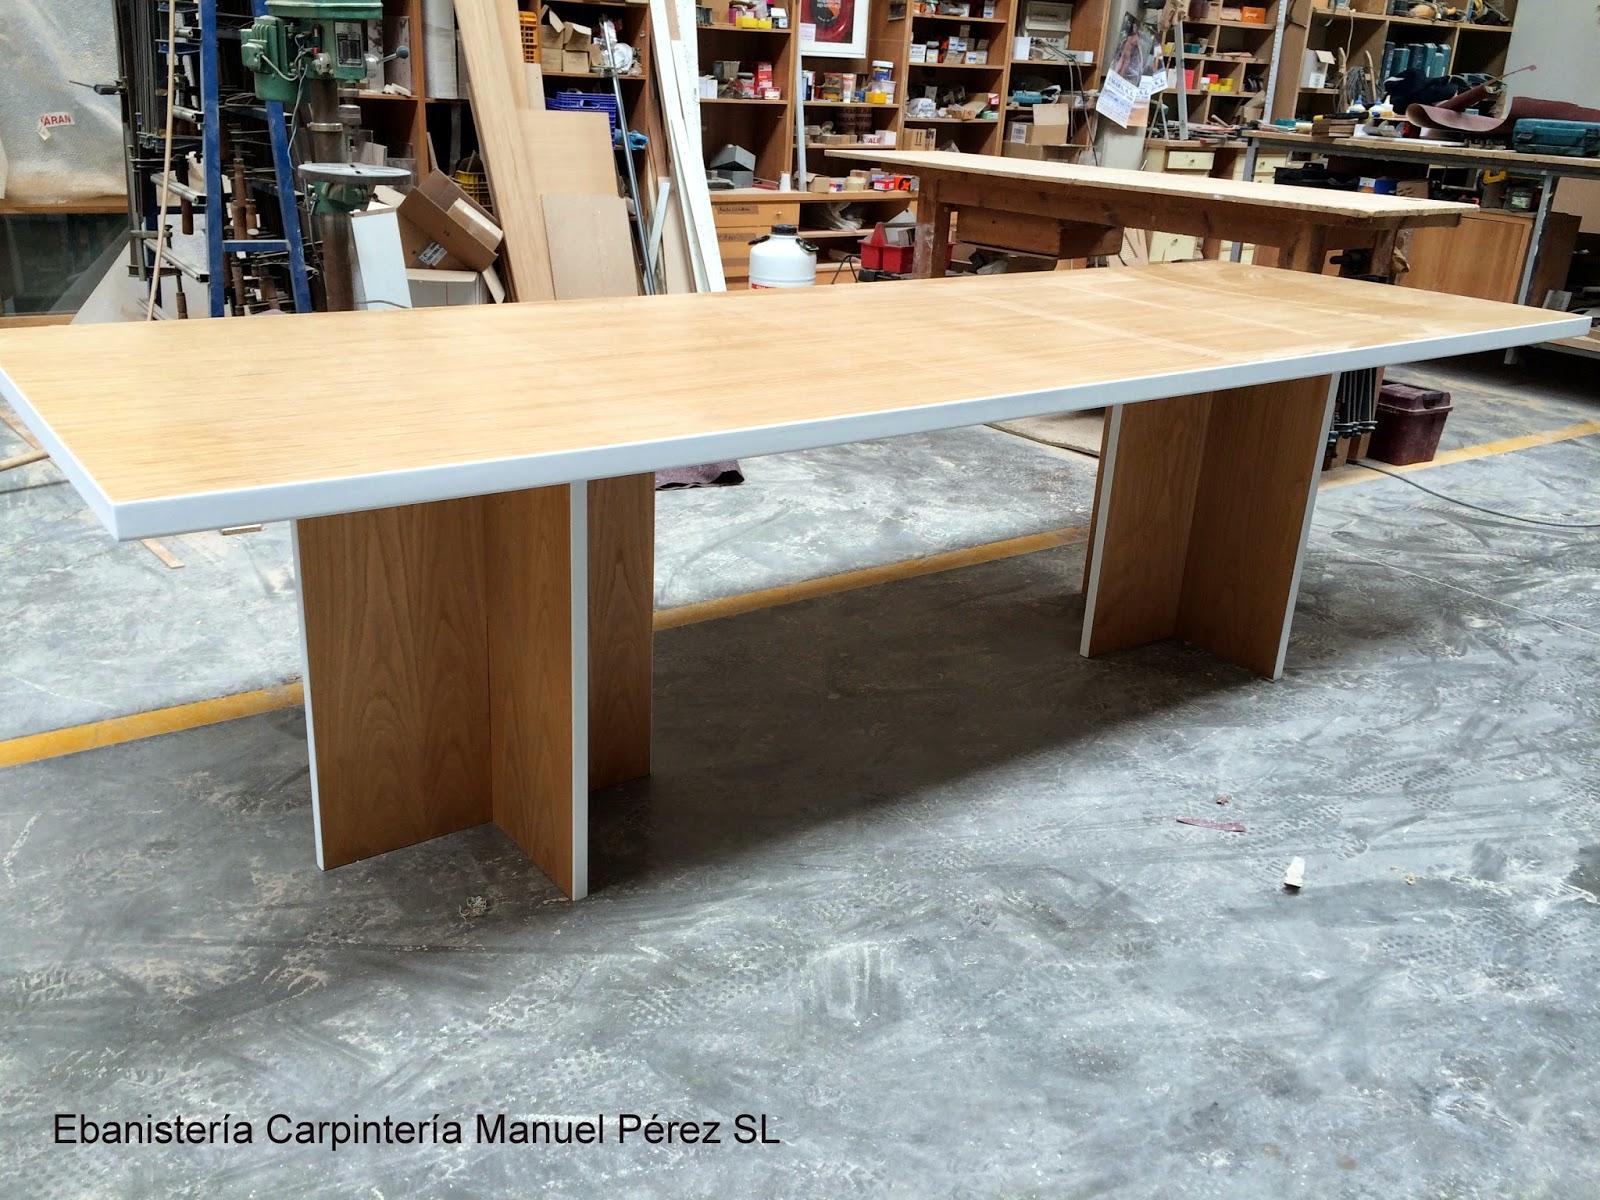 Ebanisteria carpinteria manuel perez zaragoza mueble - Canto para madera ...